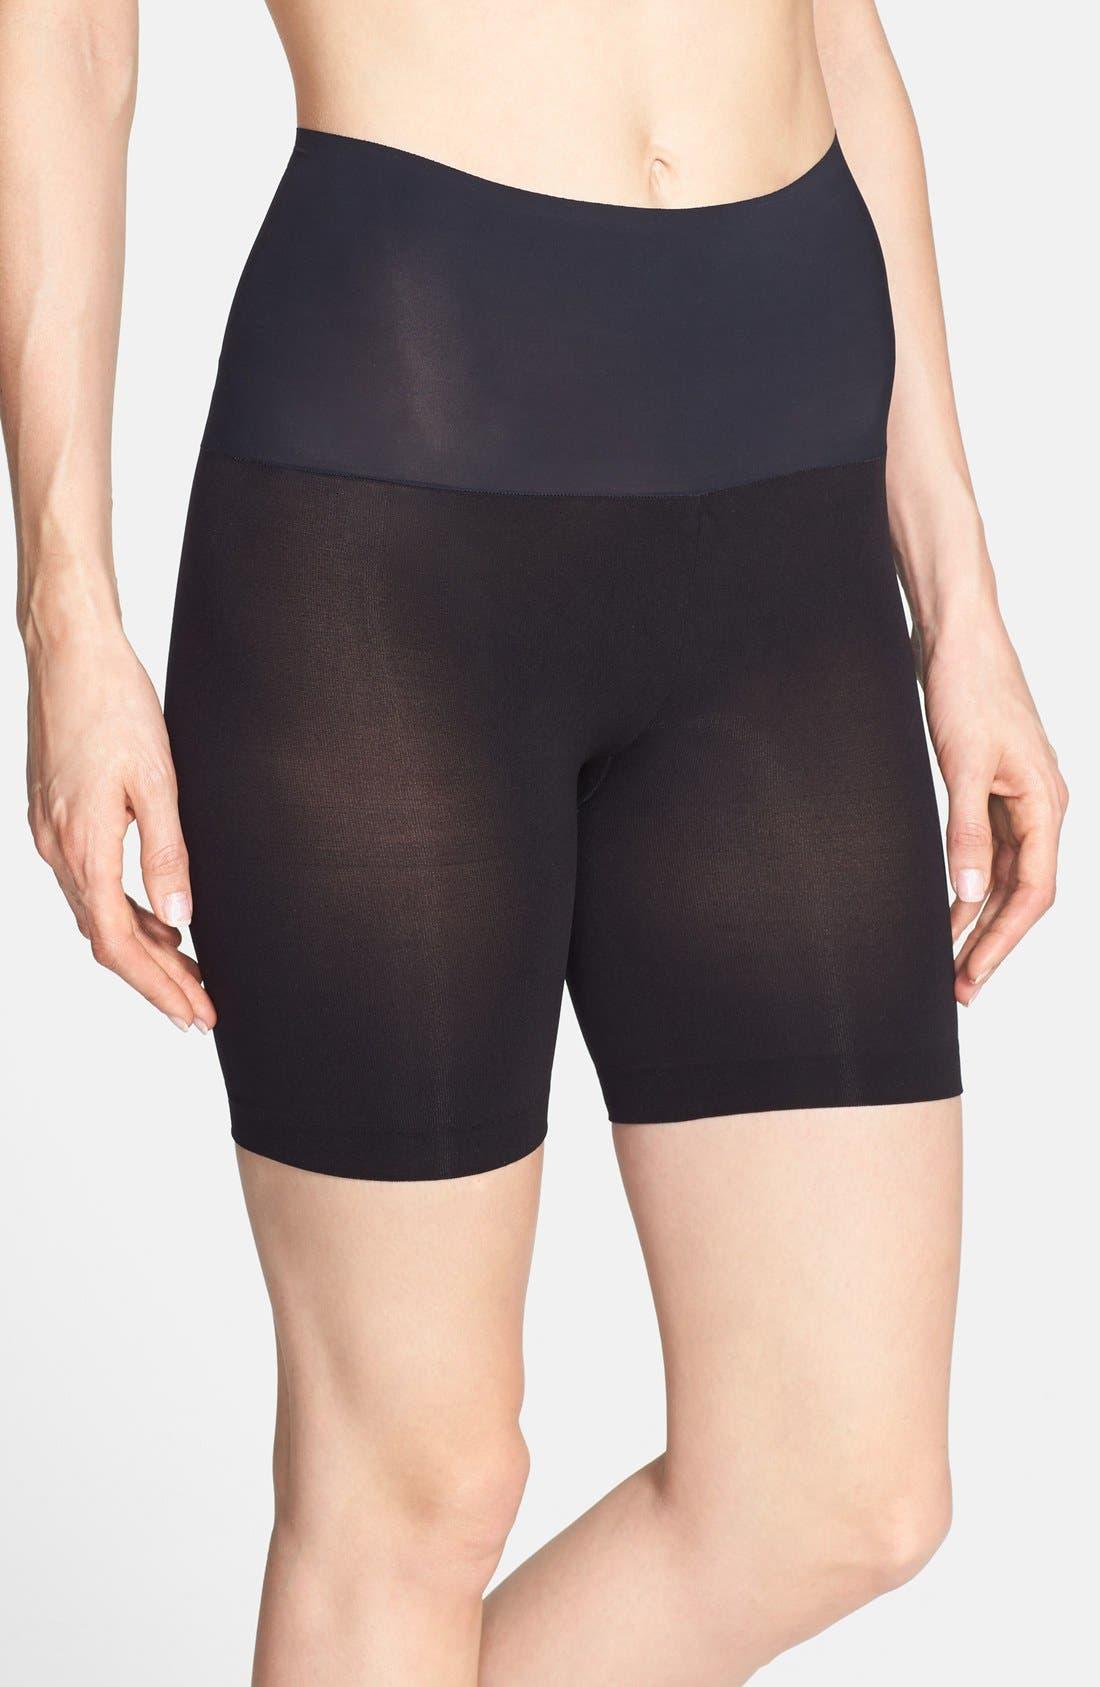 Alternate Image 1 Selected - Commando 'Biker Babe' Shorts